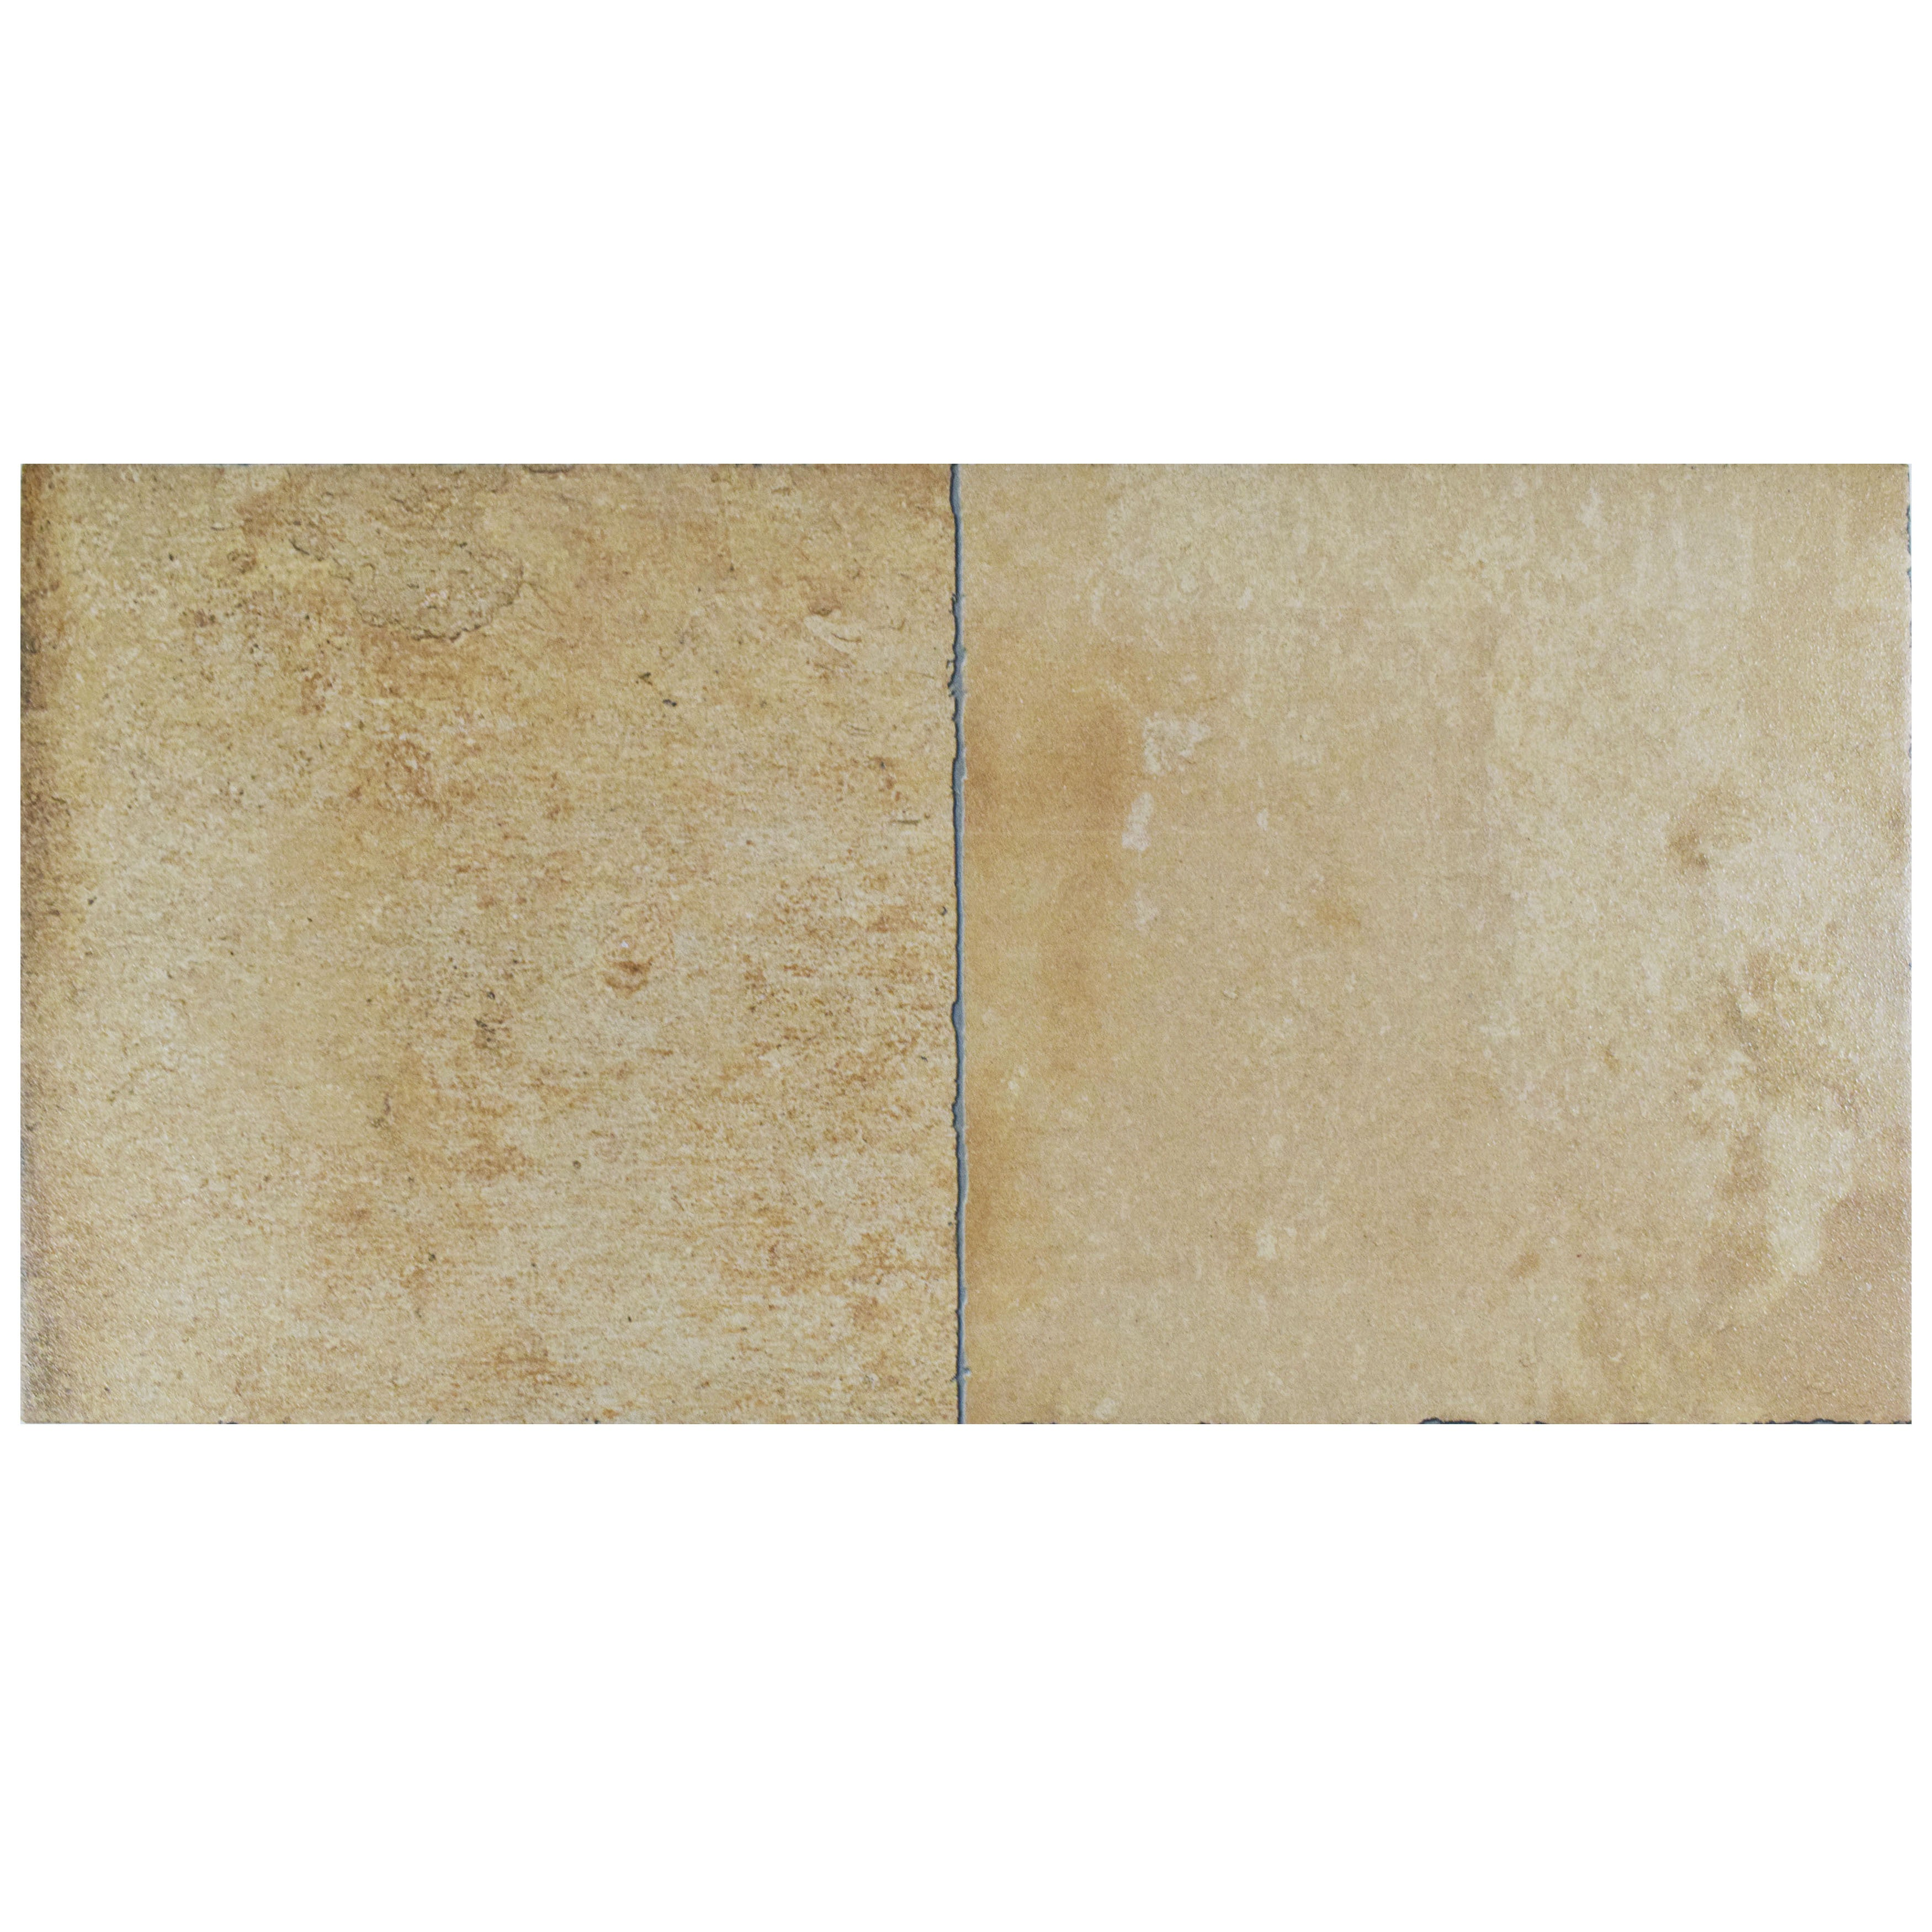 Somertile 11x22125 inch roland beige porcelain floor and wall tile somertile 11x22125 inch roland beige porcelain floor and wall tile 7 tiles1224 sqft free shipping today overstock 18933531 dailygadgetfo Gallery